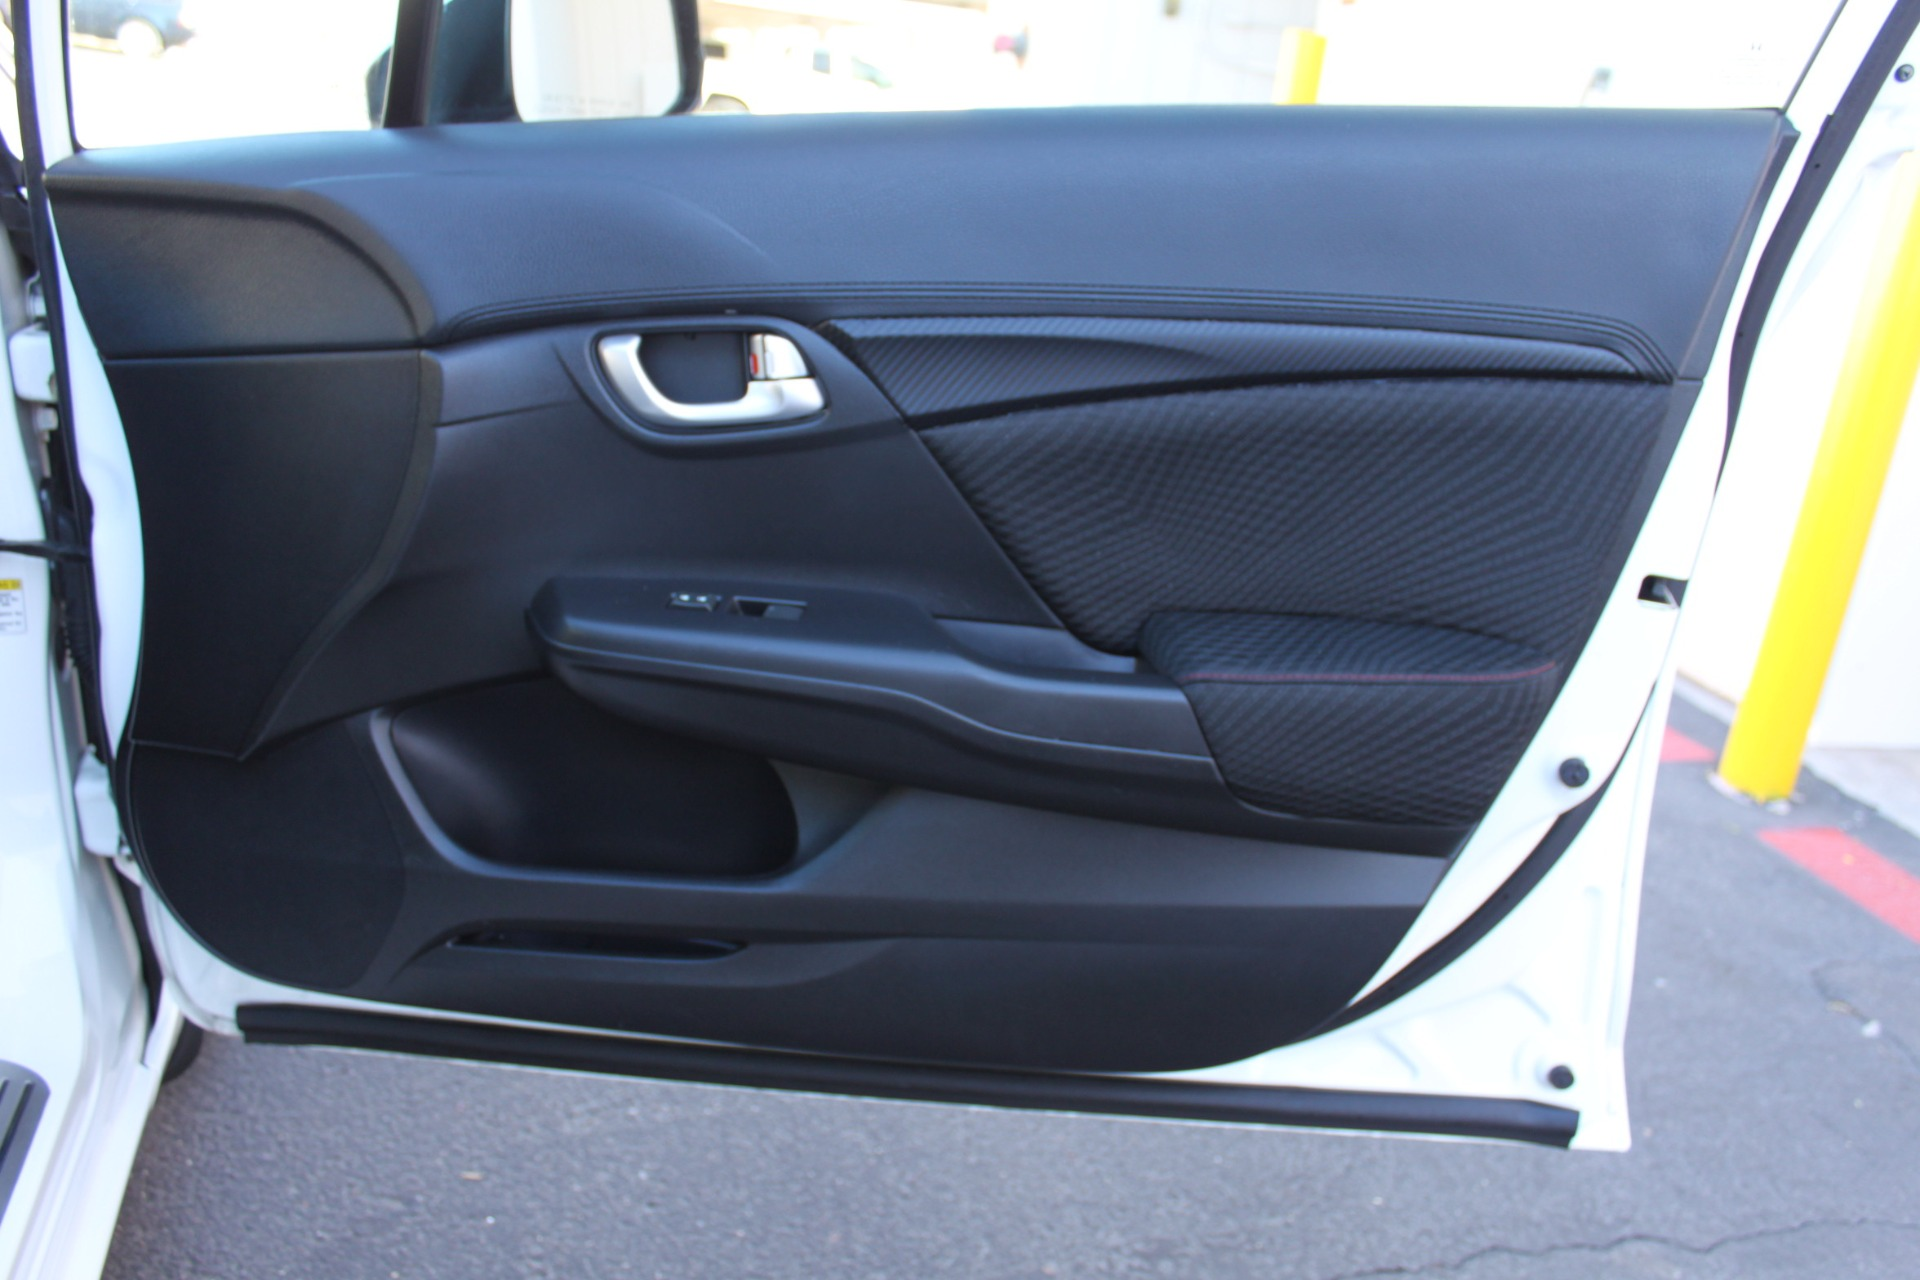 Used-2013-Honda-Civic-Sedan-Si-Mercedes-Benz